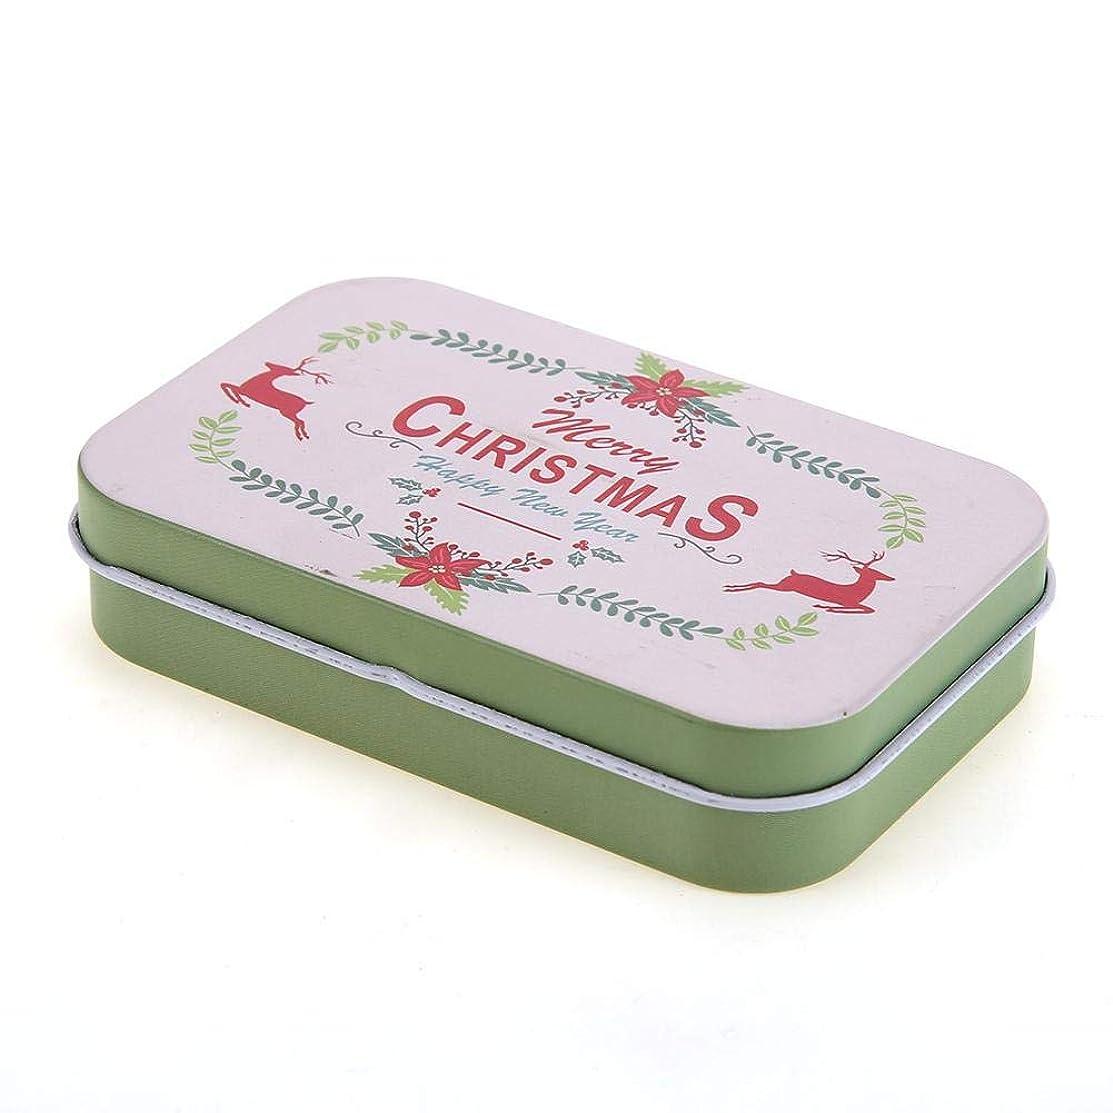 Powlancejp 収納ボックス 収納ケース 長方形 金属缶 キャンディーコンテナ キャンディーオーガナイザー かわいいタイプ クリスマス プレゼント 7